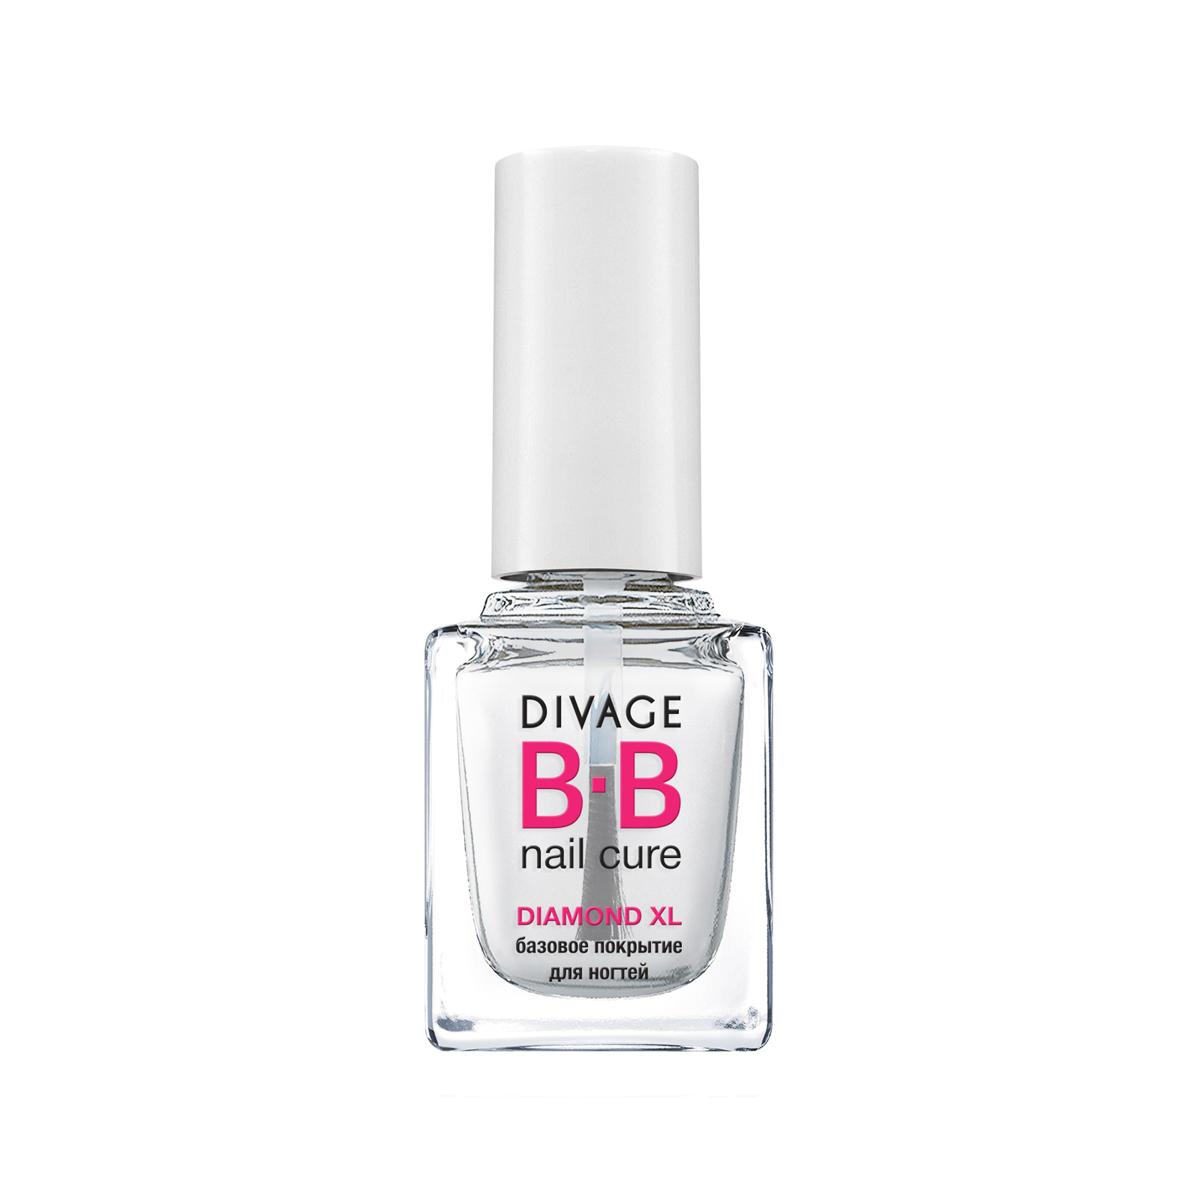 "DIVAGE BB NAIL CURE Базовое покрытие для ногтей ""DIAMOND XL"", 12 мл"